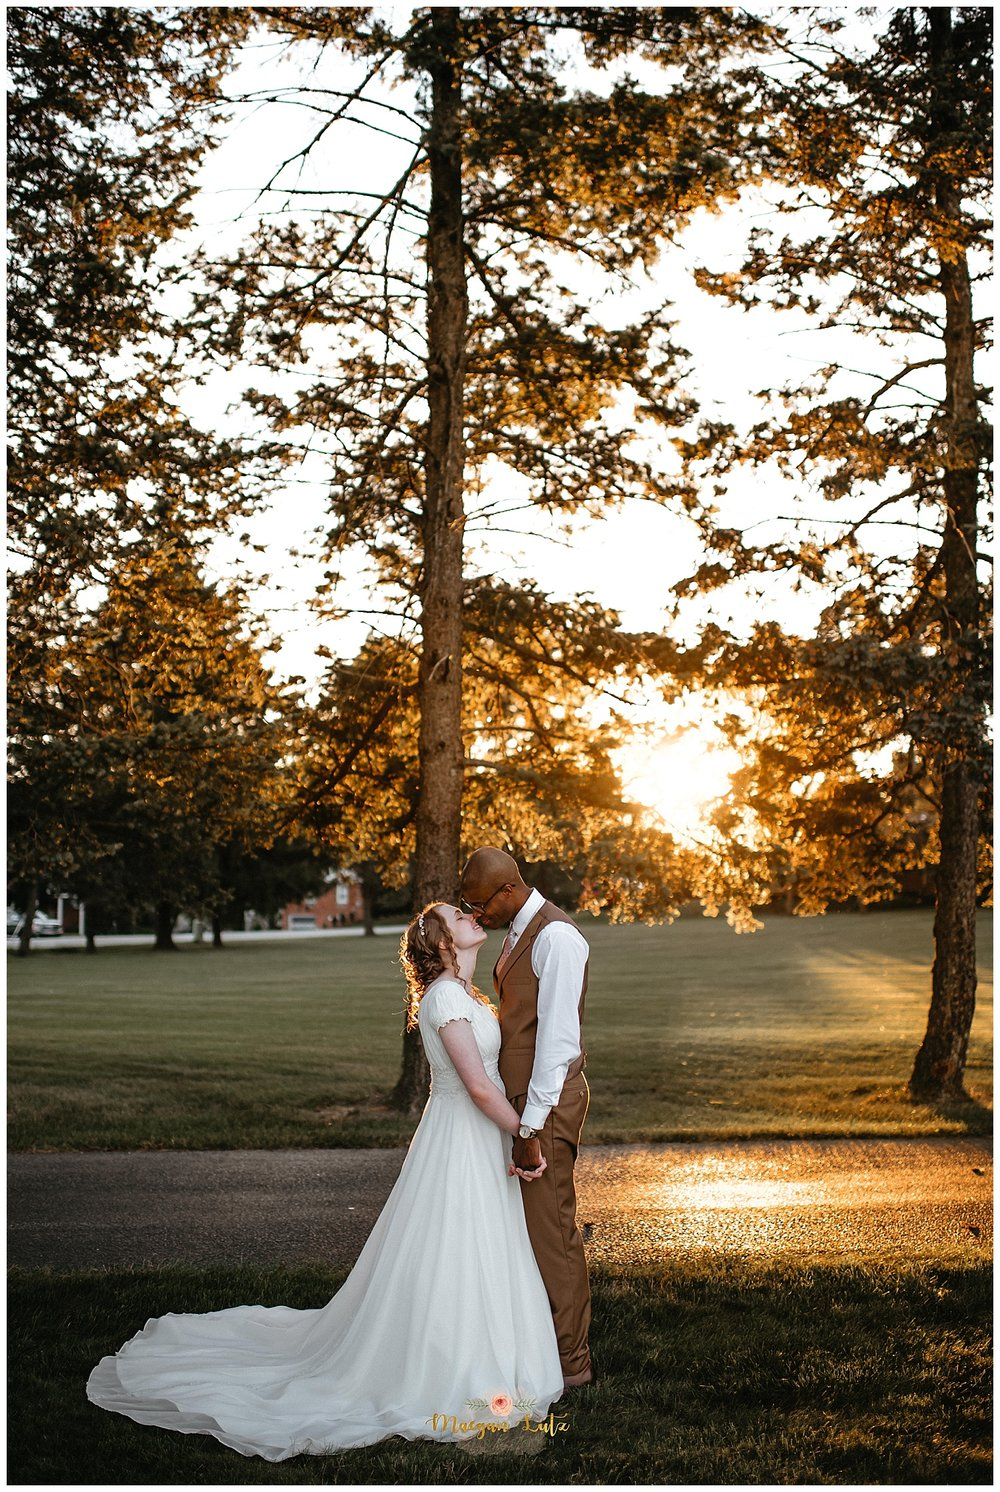 NEPA-Wedding-Photographer-in-Central-PA_0147.jpg